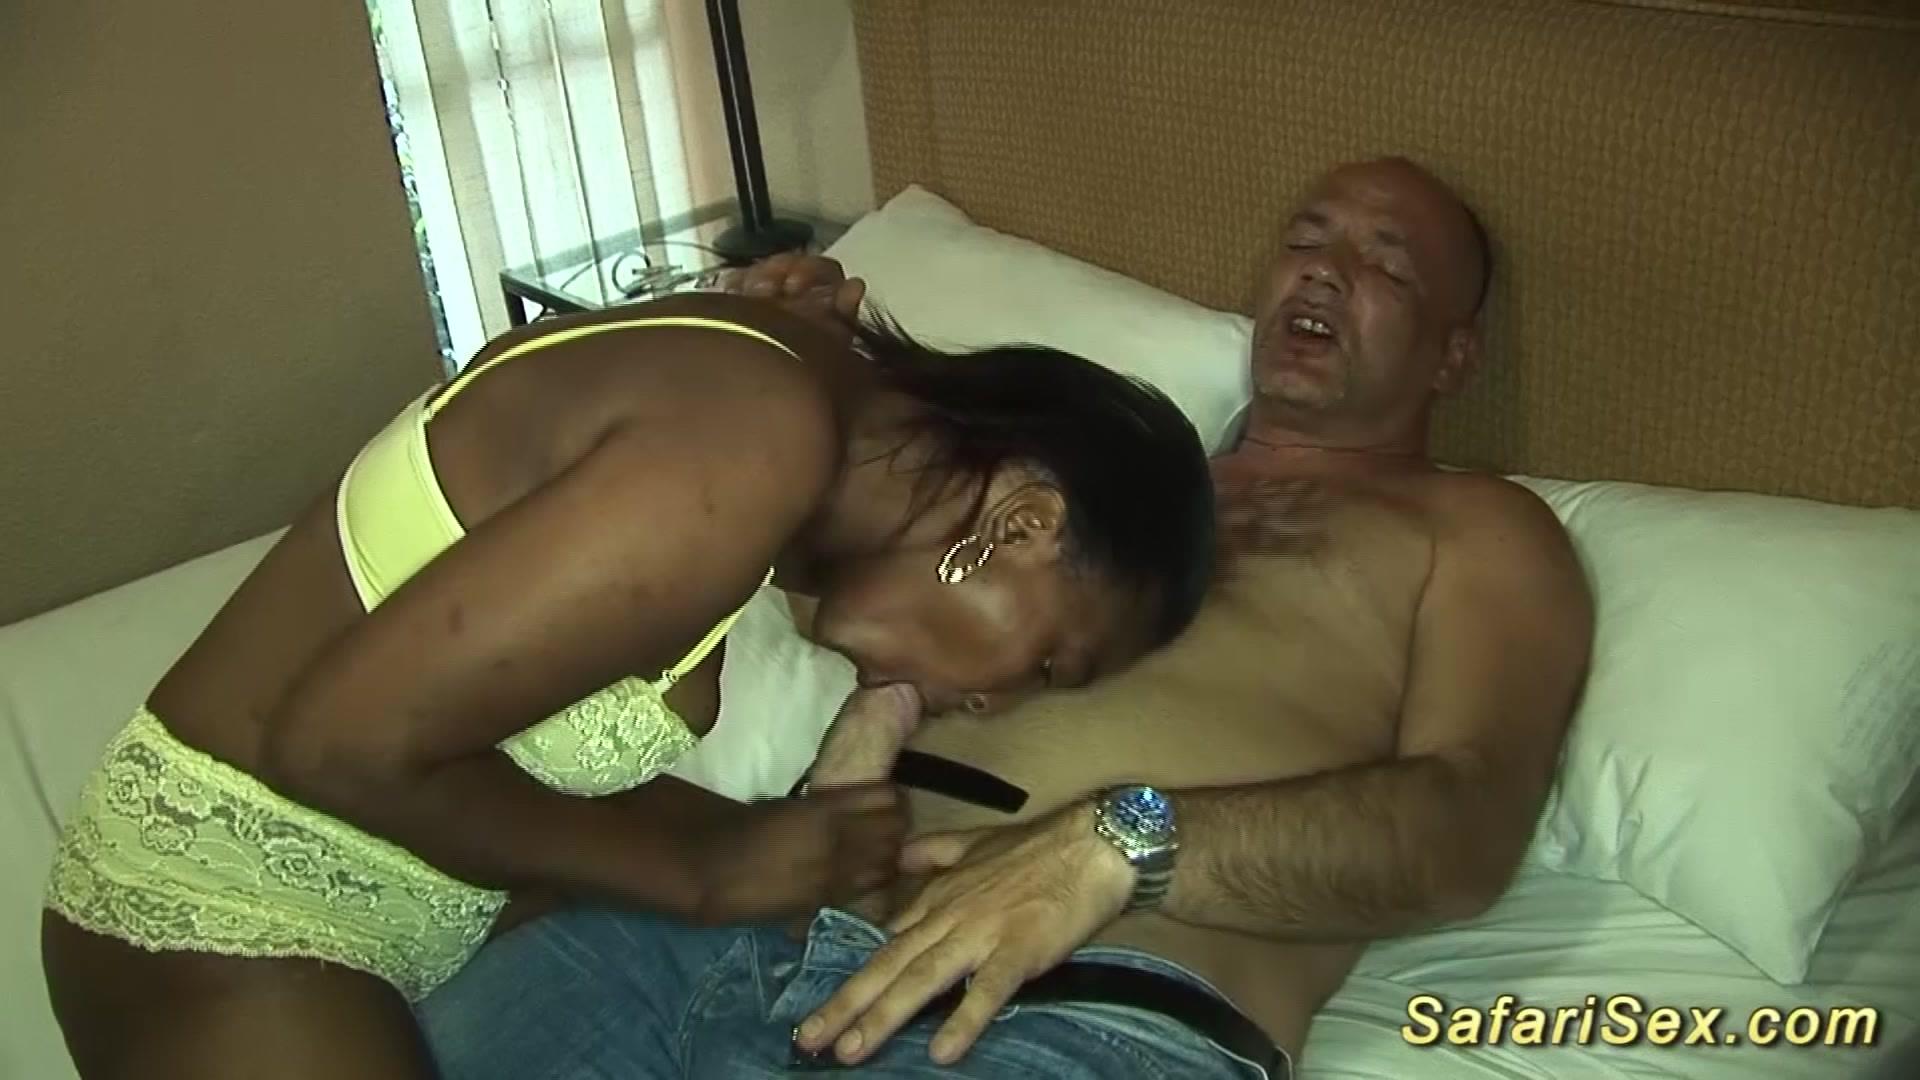 Tube Safari Porn